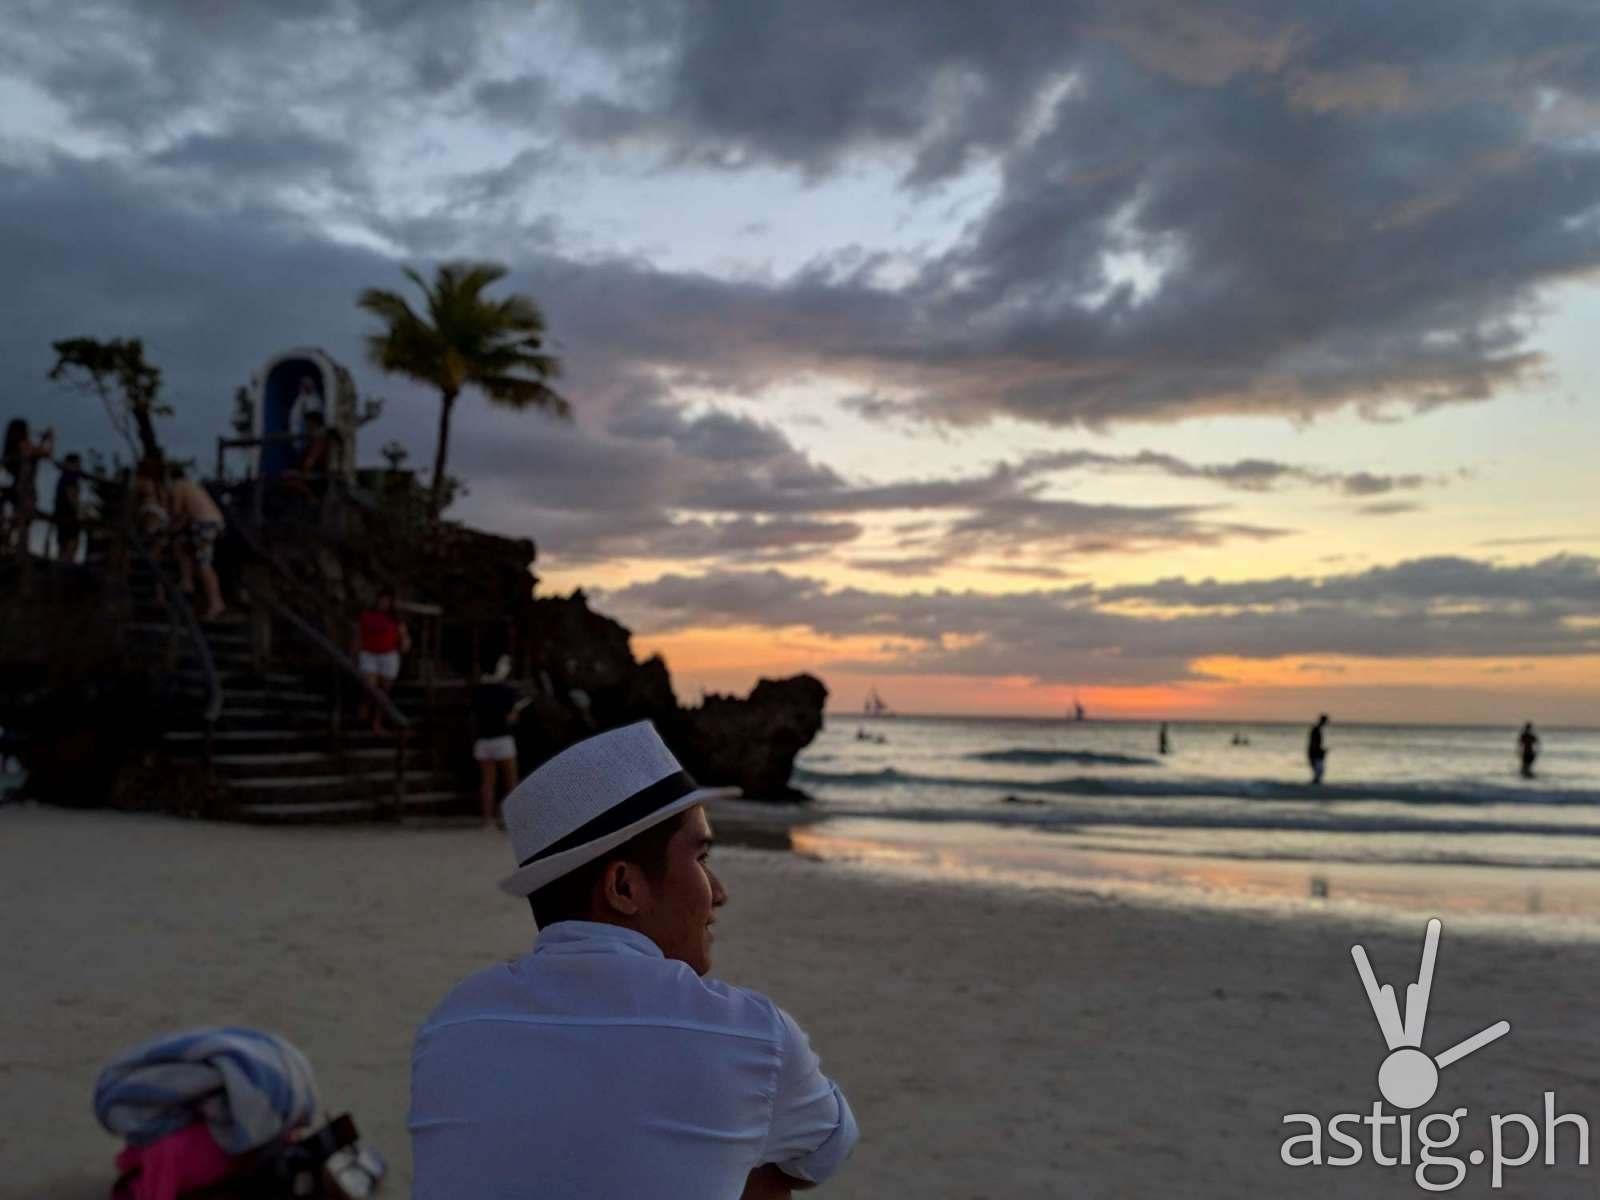 Sunset - Boracay Philippines re-opening smartphone photo taken on an ASUS ZenFone 5 by Den Uy of TechKuya